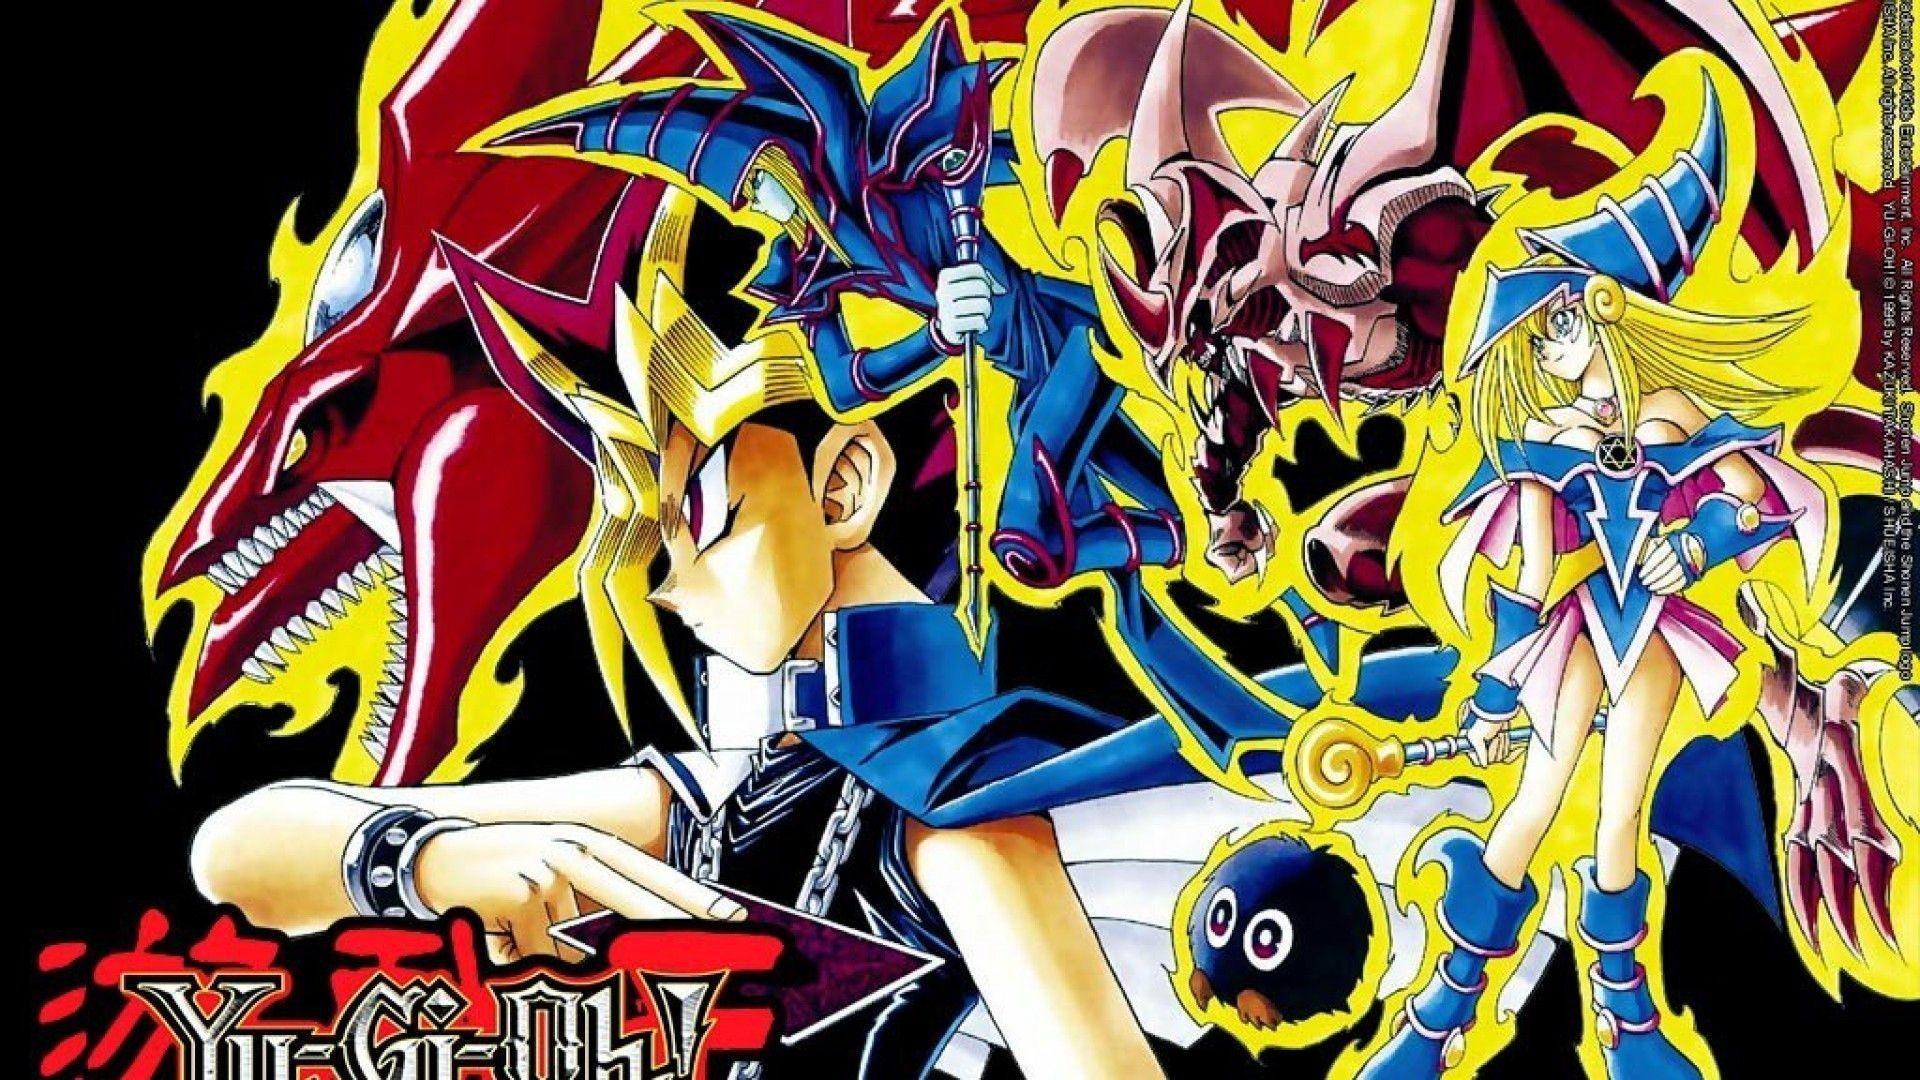 Res: 1920x1080, Yugioh Wallpaper HD Free Download | Anime Wallpaper